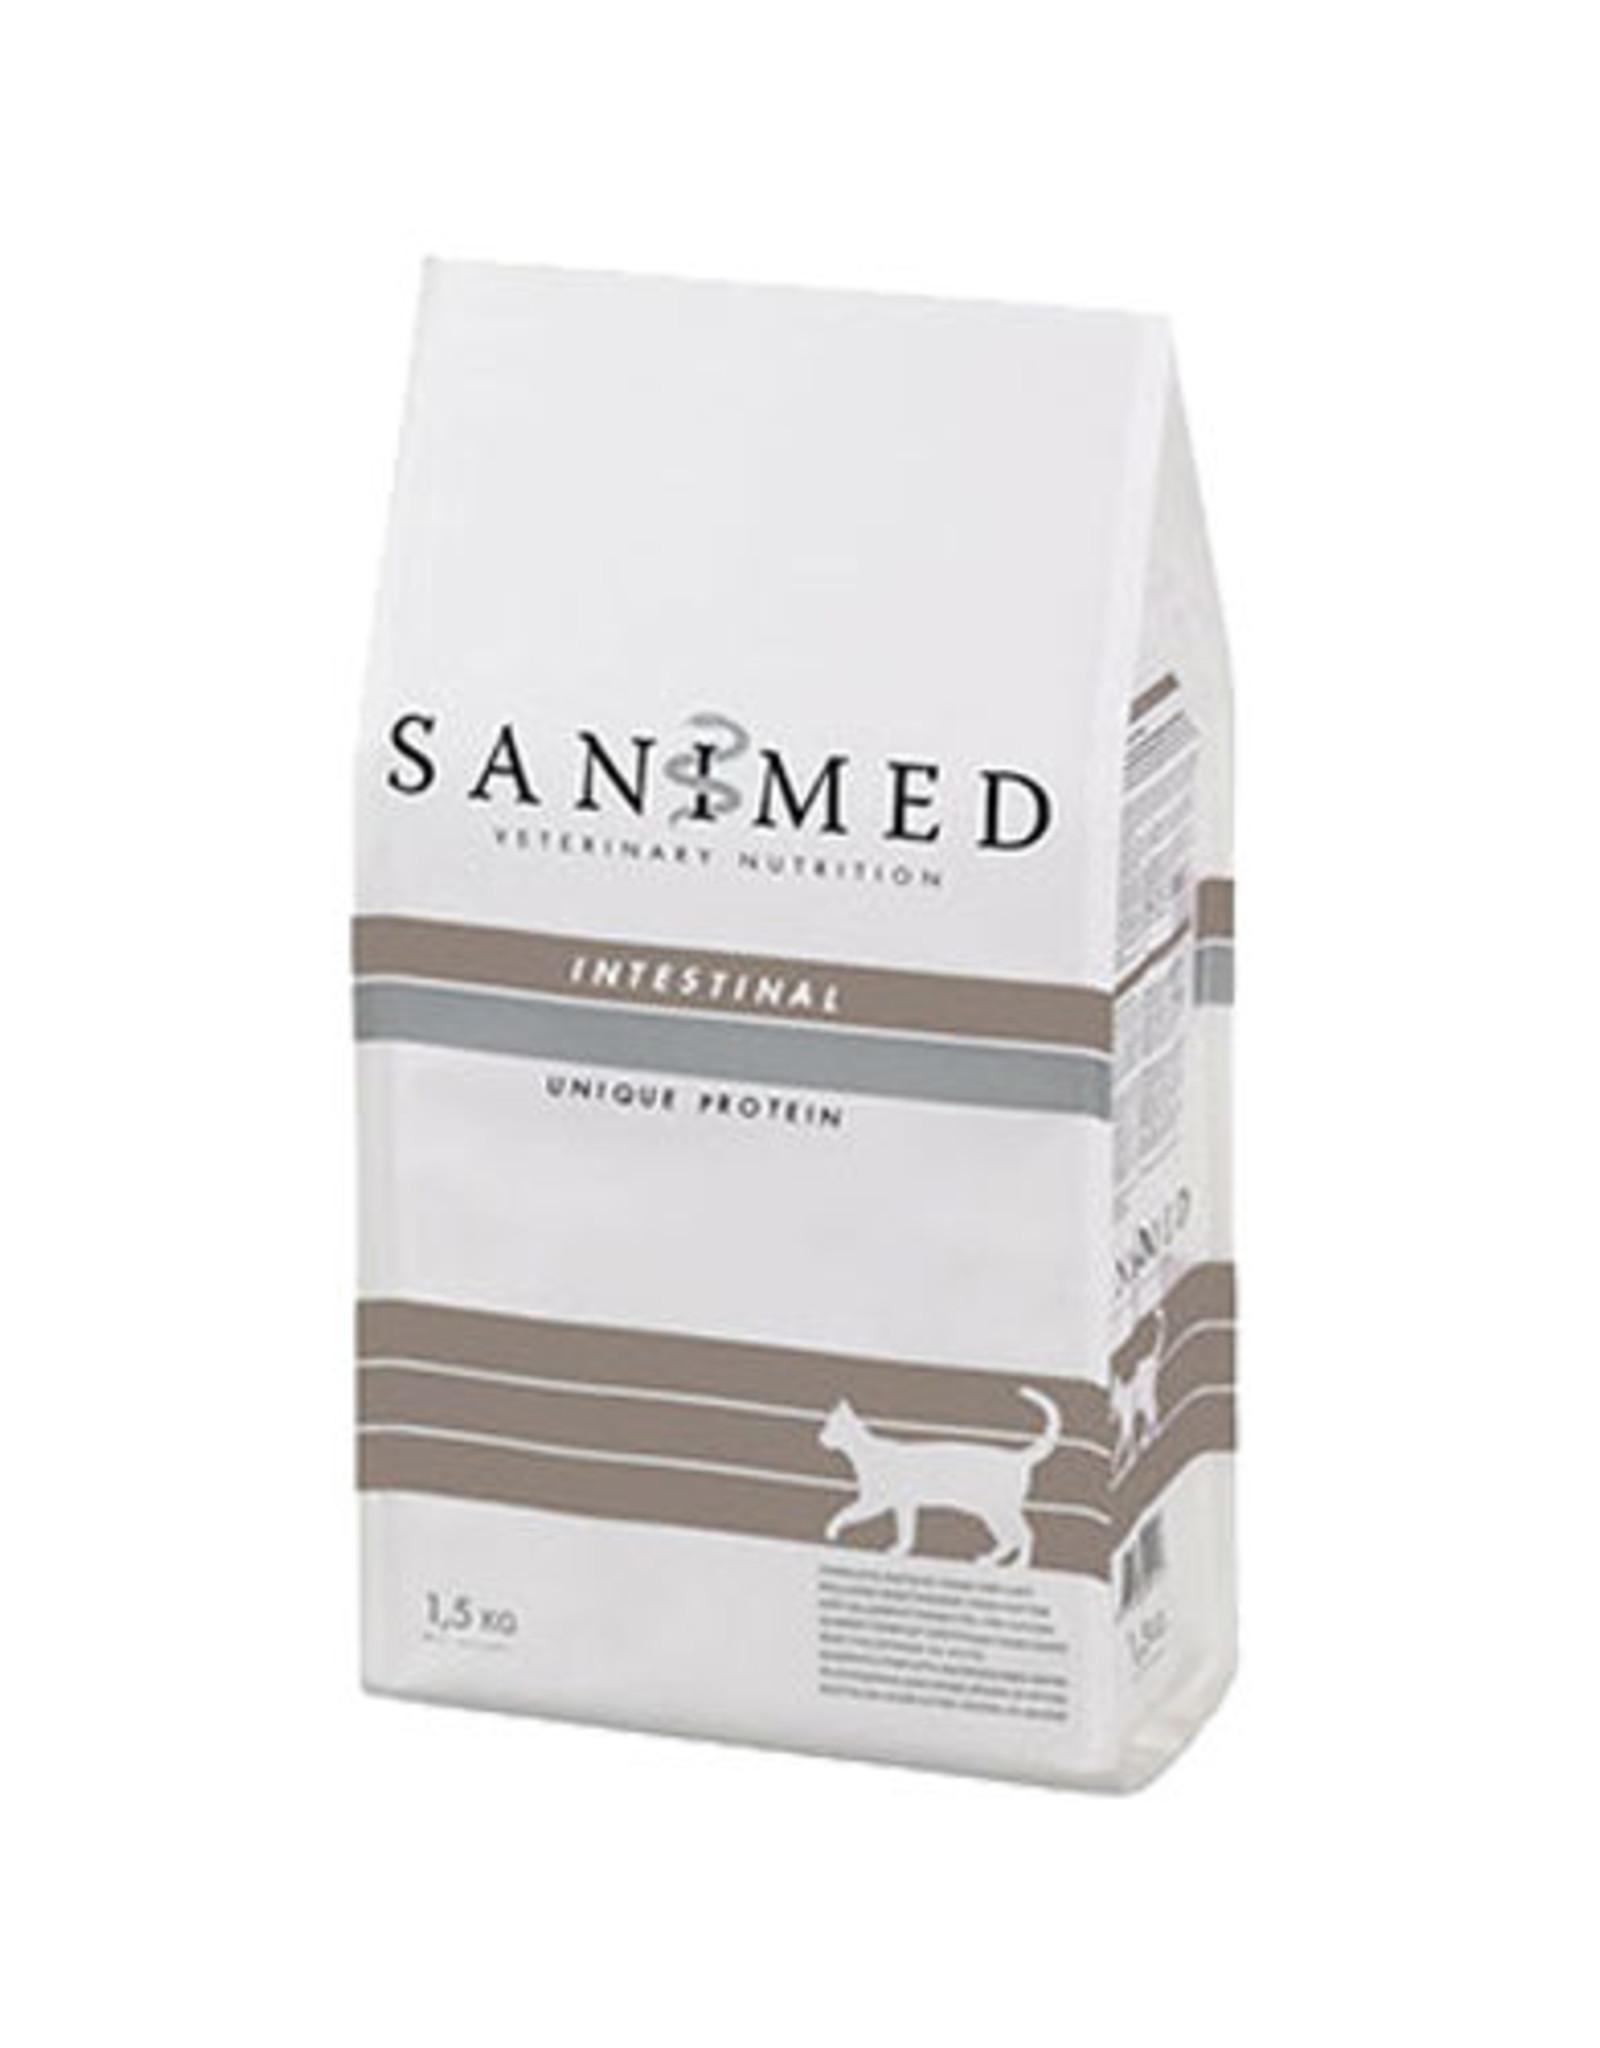 Sanimed Sanimed Feline Intestinal With Insect Kat 1.5kg